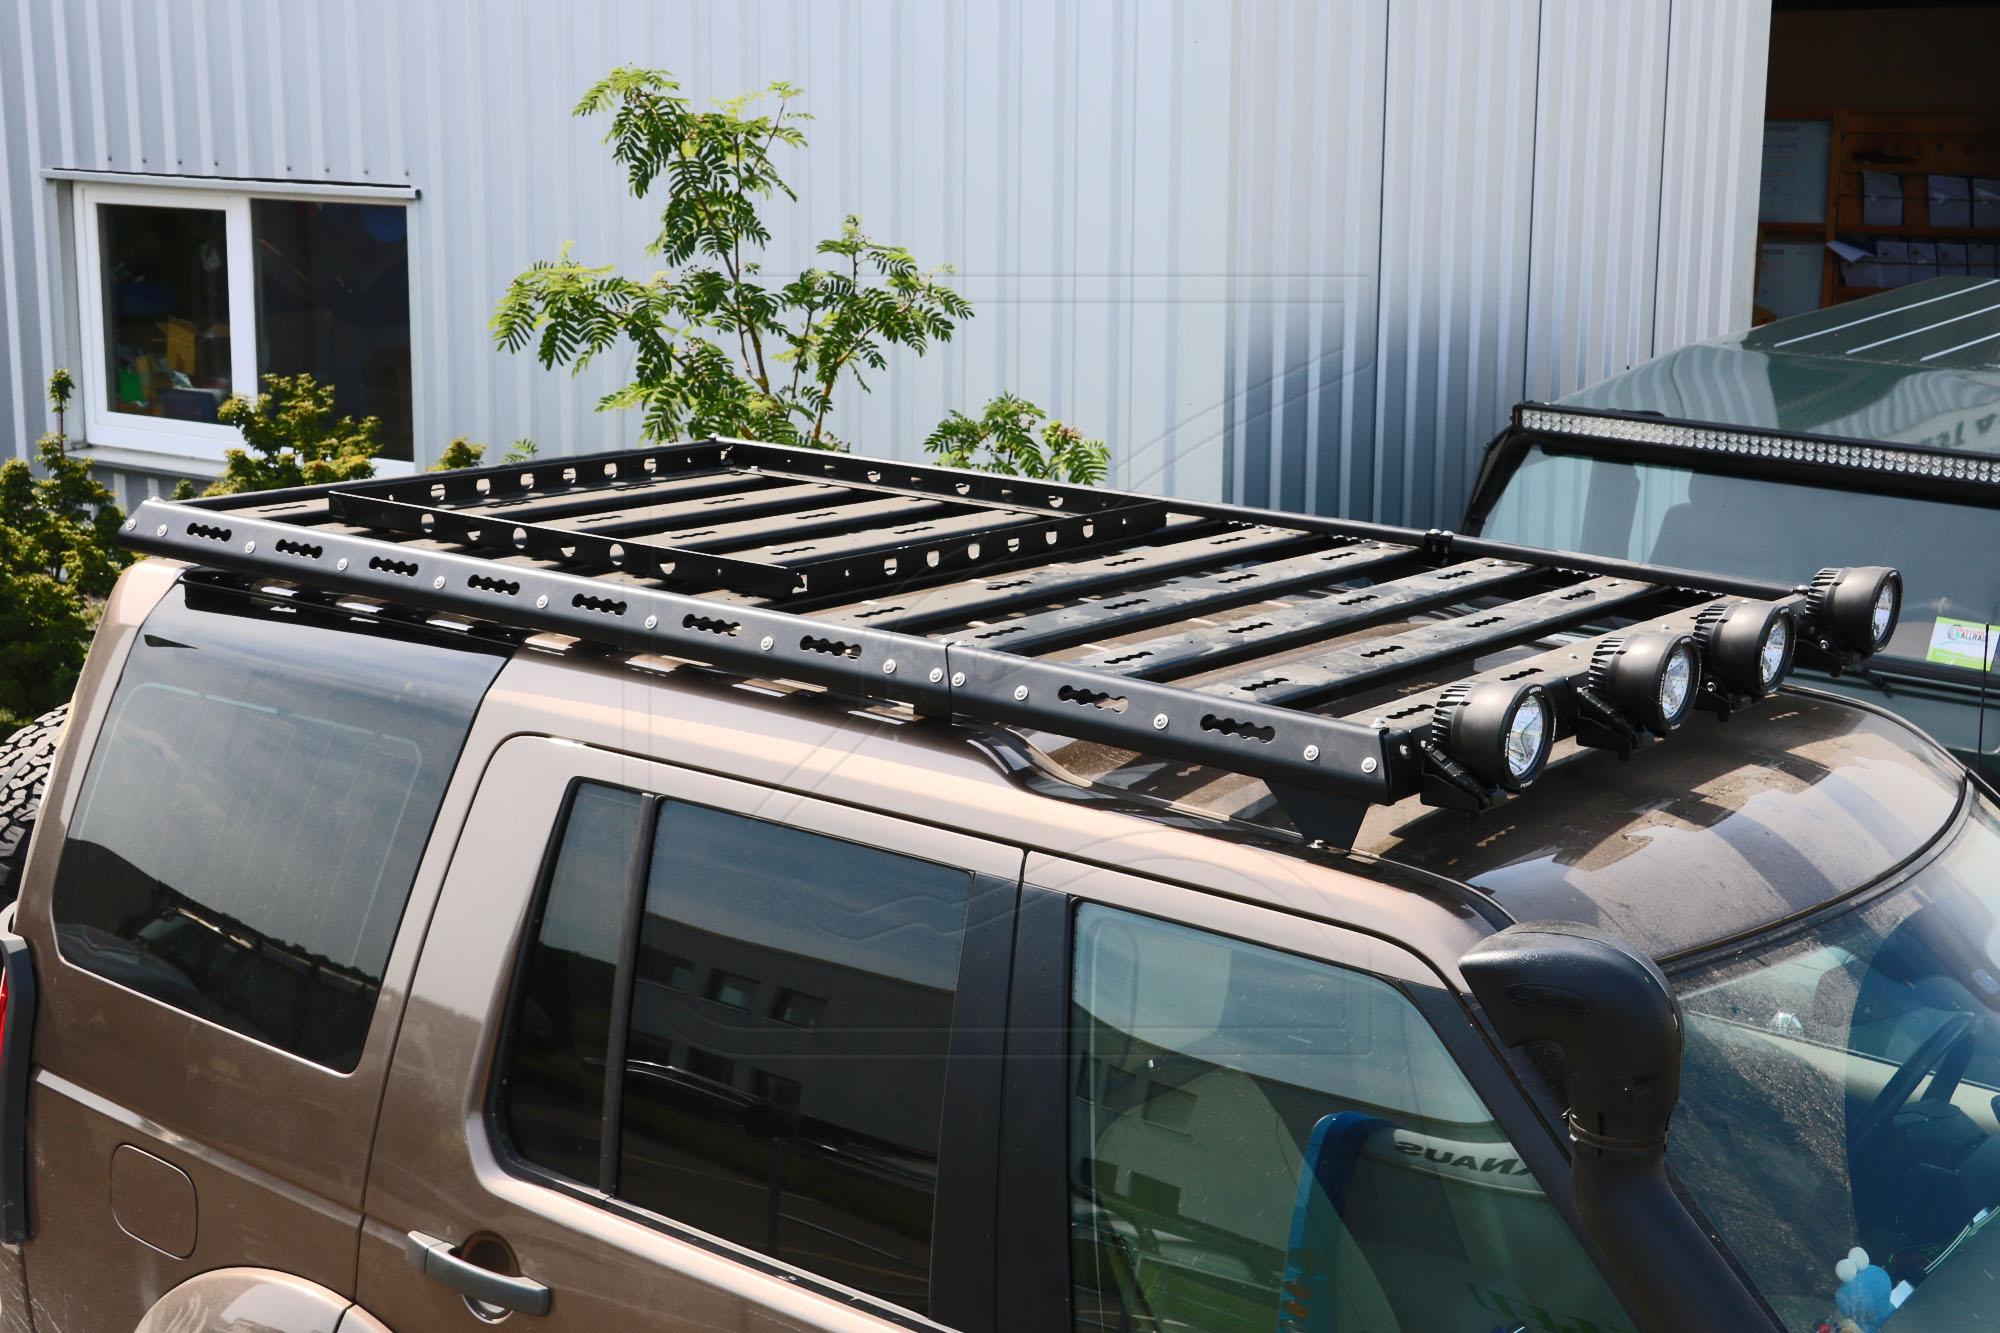 Cargobear Discovery Roof Rack 3 4 4x4overlander